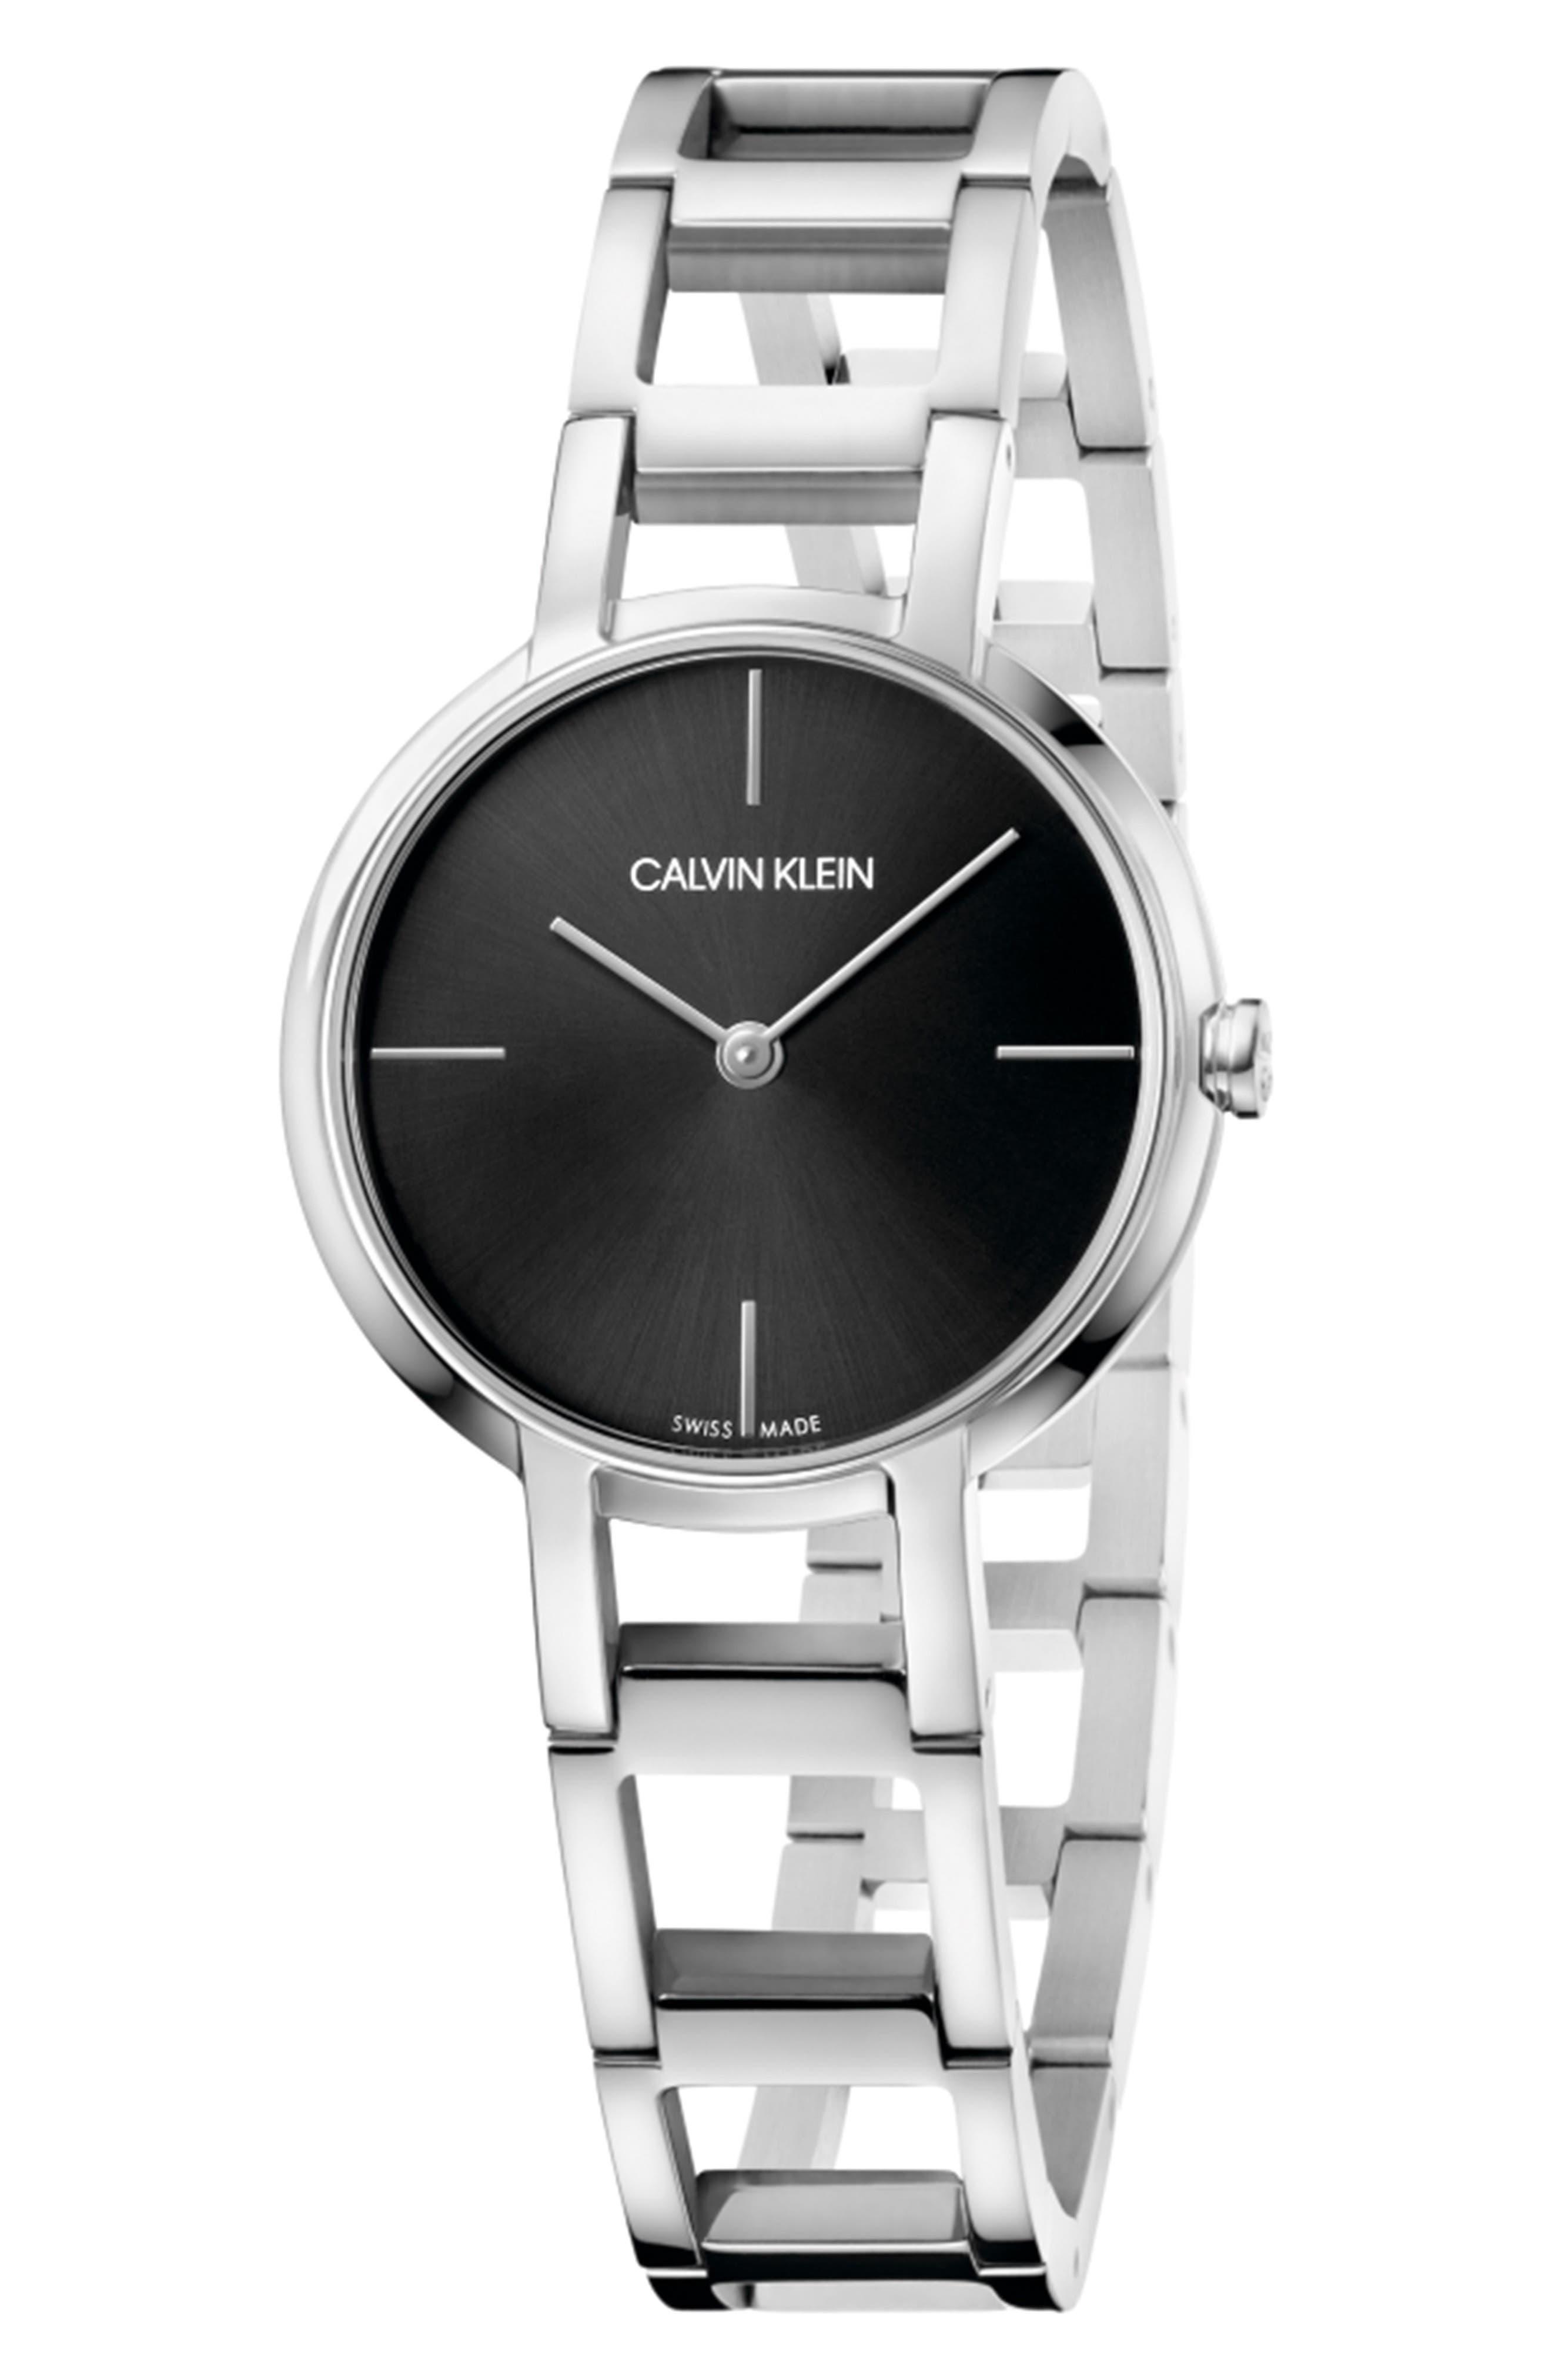 CALVIN KLEIN Cheers Bracelet Watch, 32mm, Main, color, SILVER/ BLACK/ SILVER